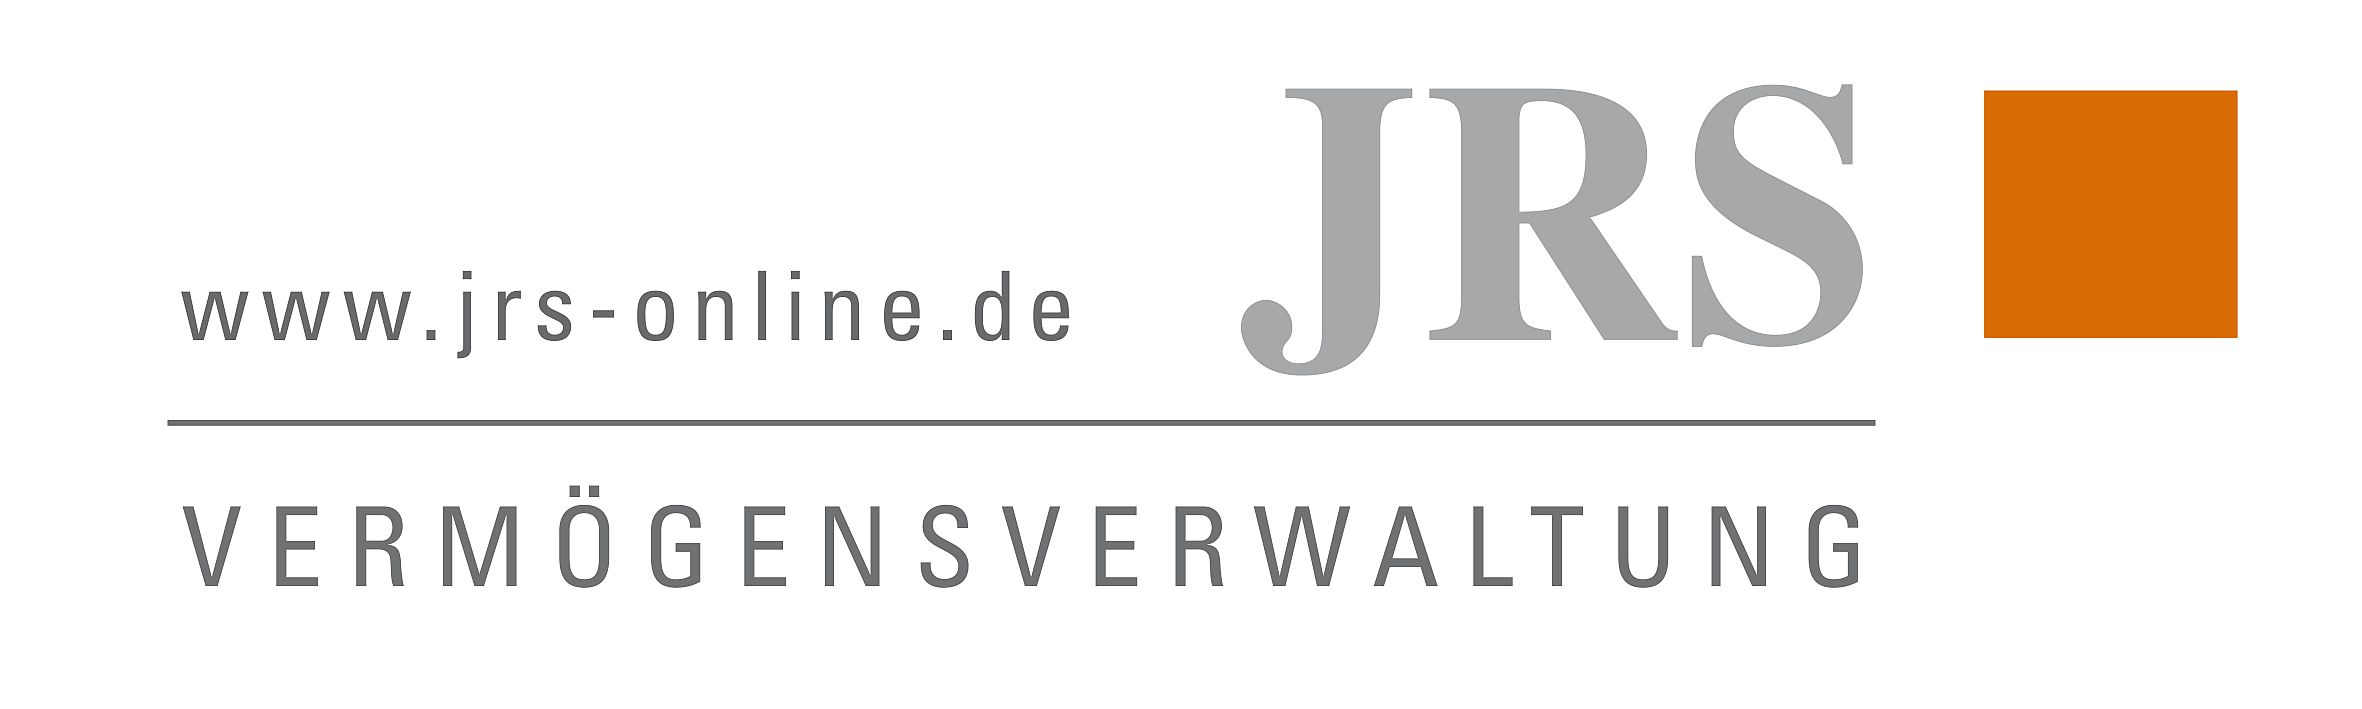 JRS Vermögensverwaltung